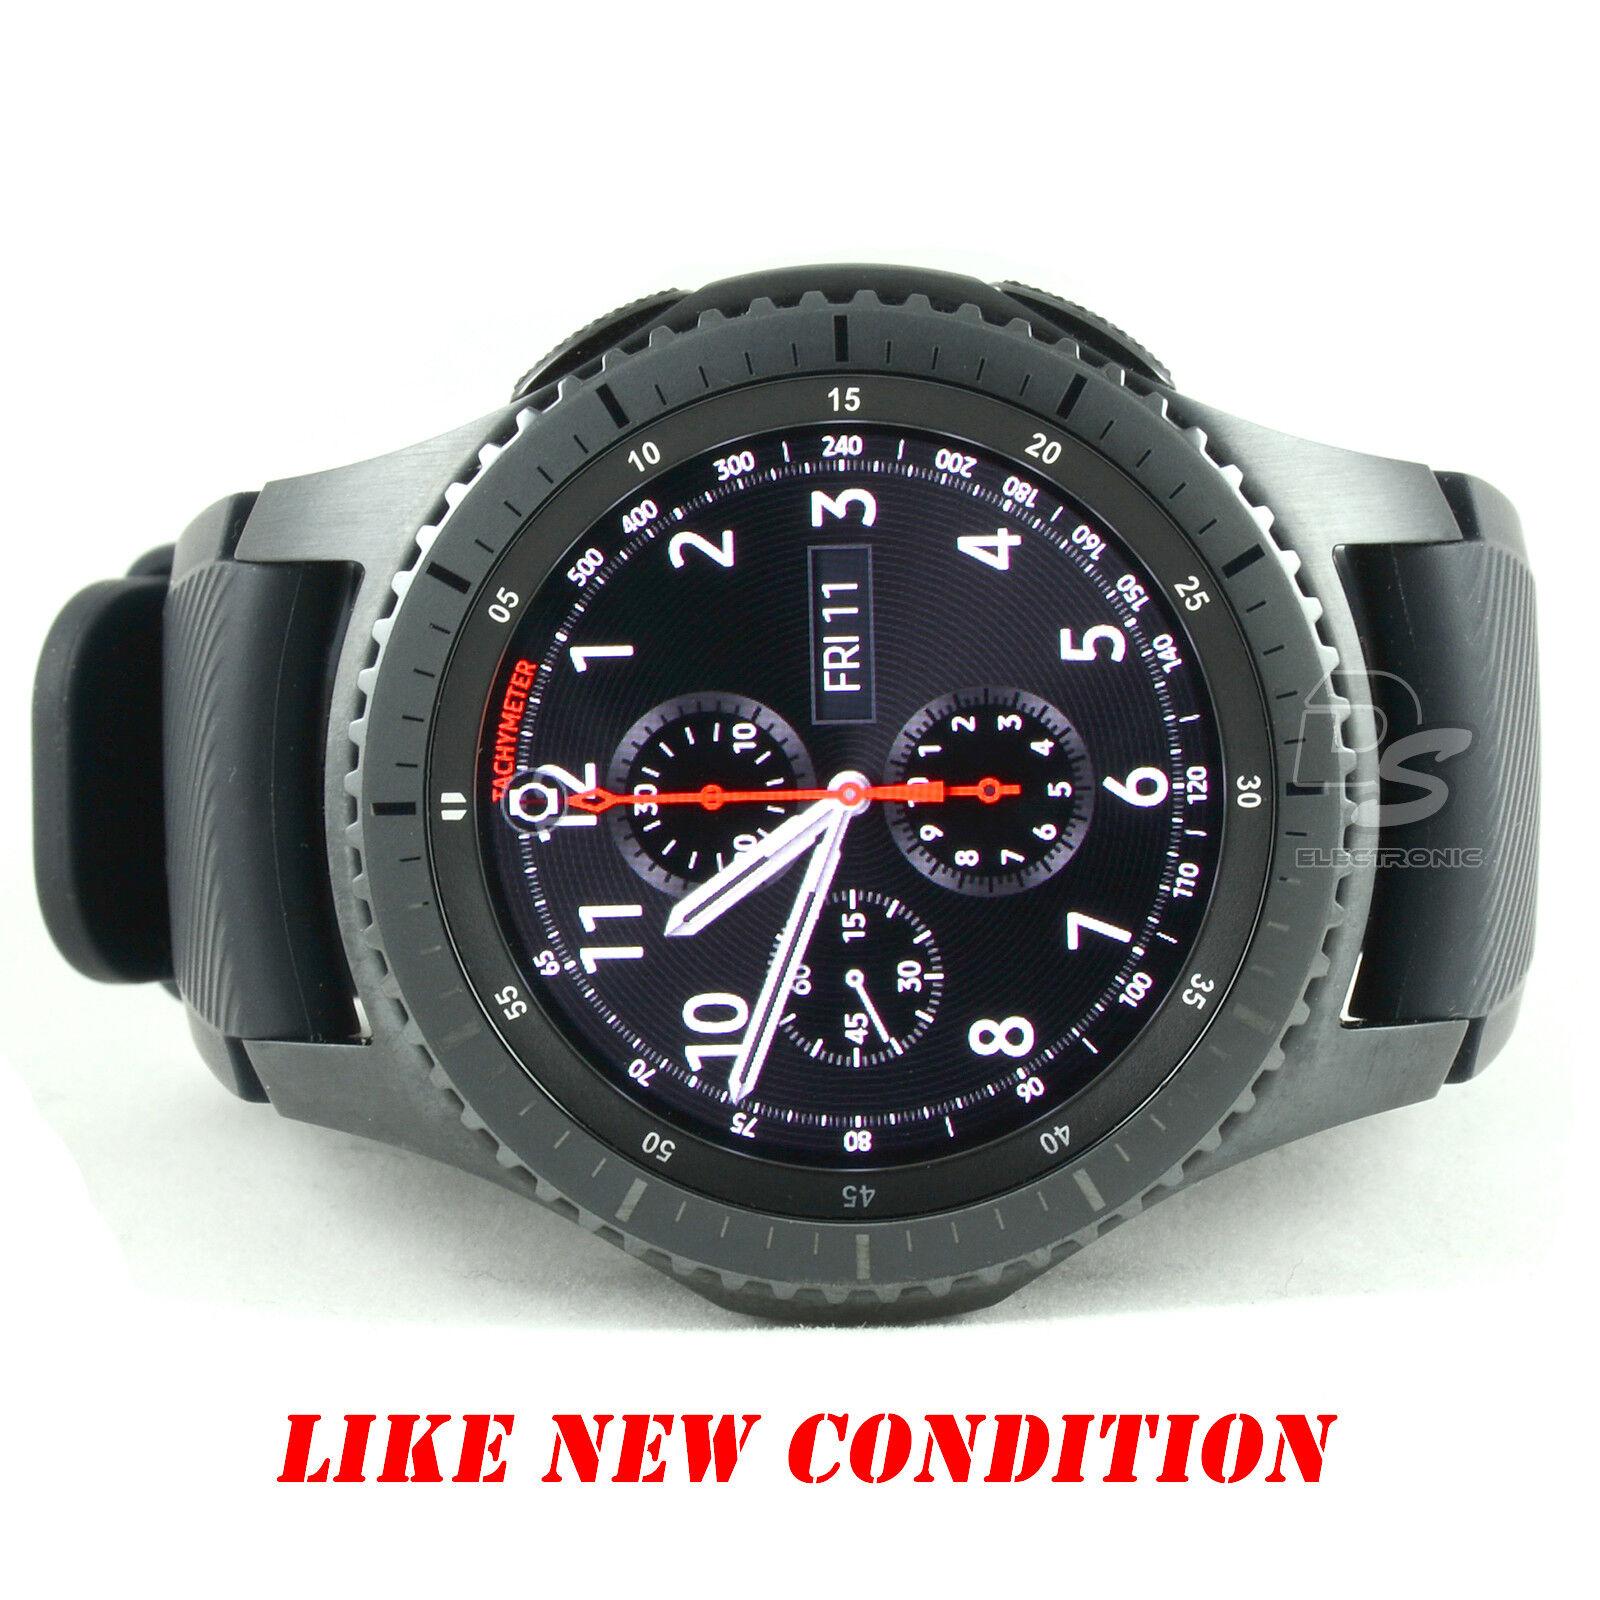 Samsung Gear S3 Frontier SM-R760 WIFI Bluetooth Smart Watch SM-R760NDAAXAR